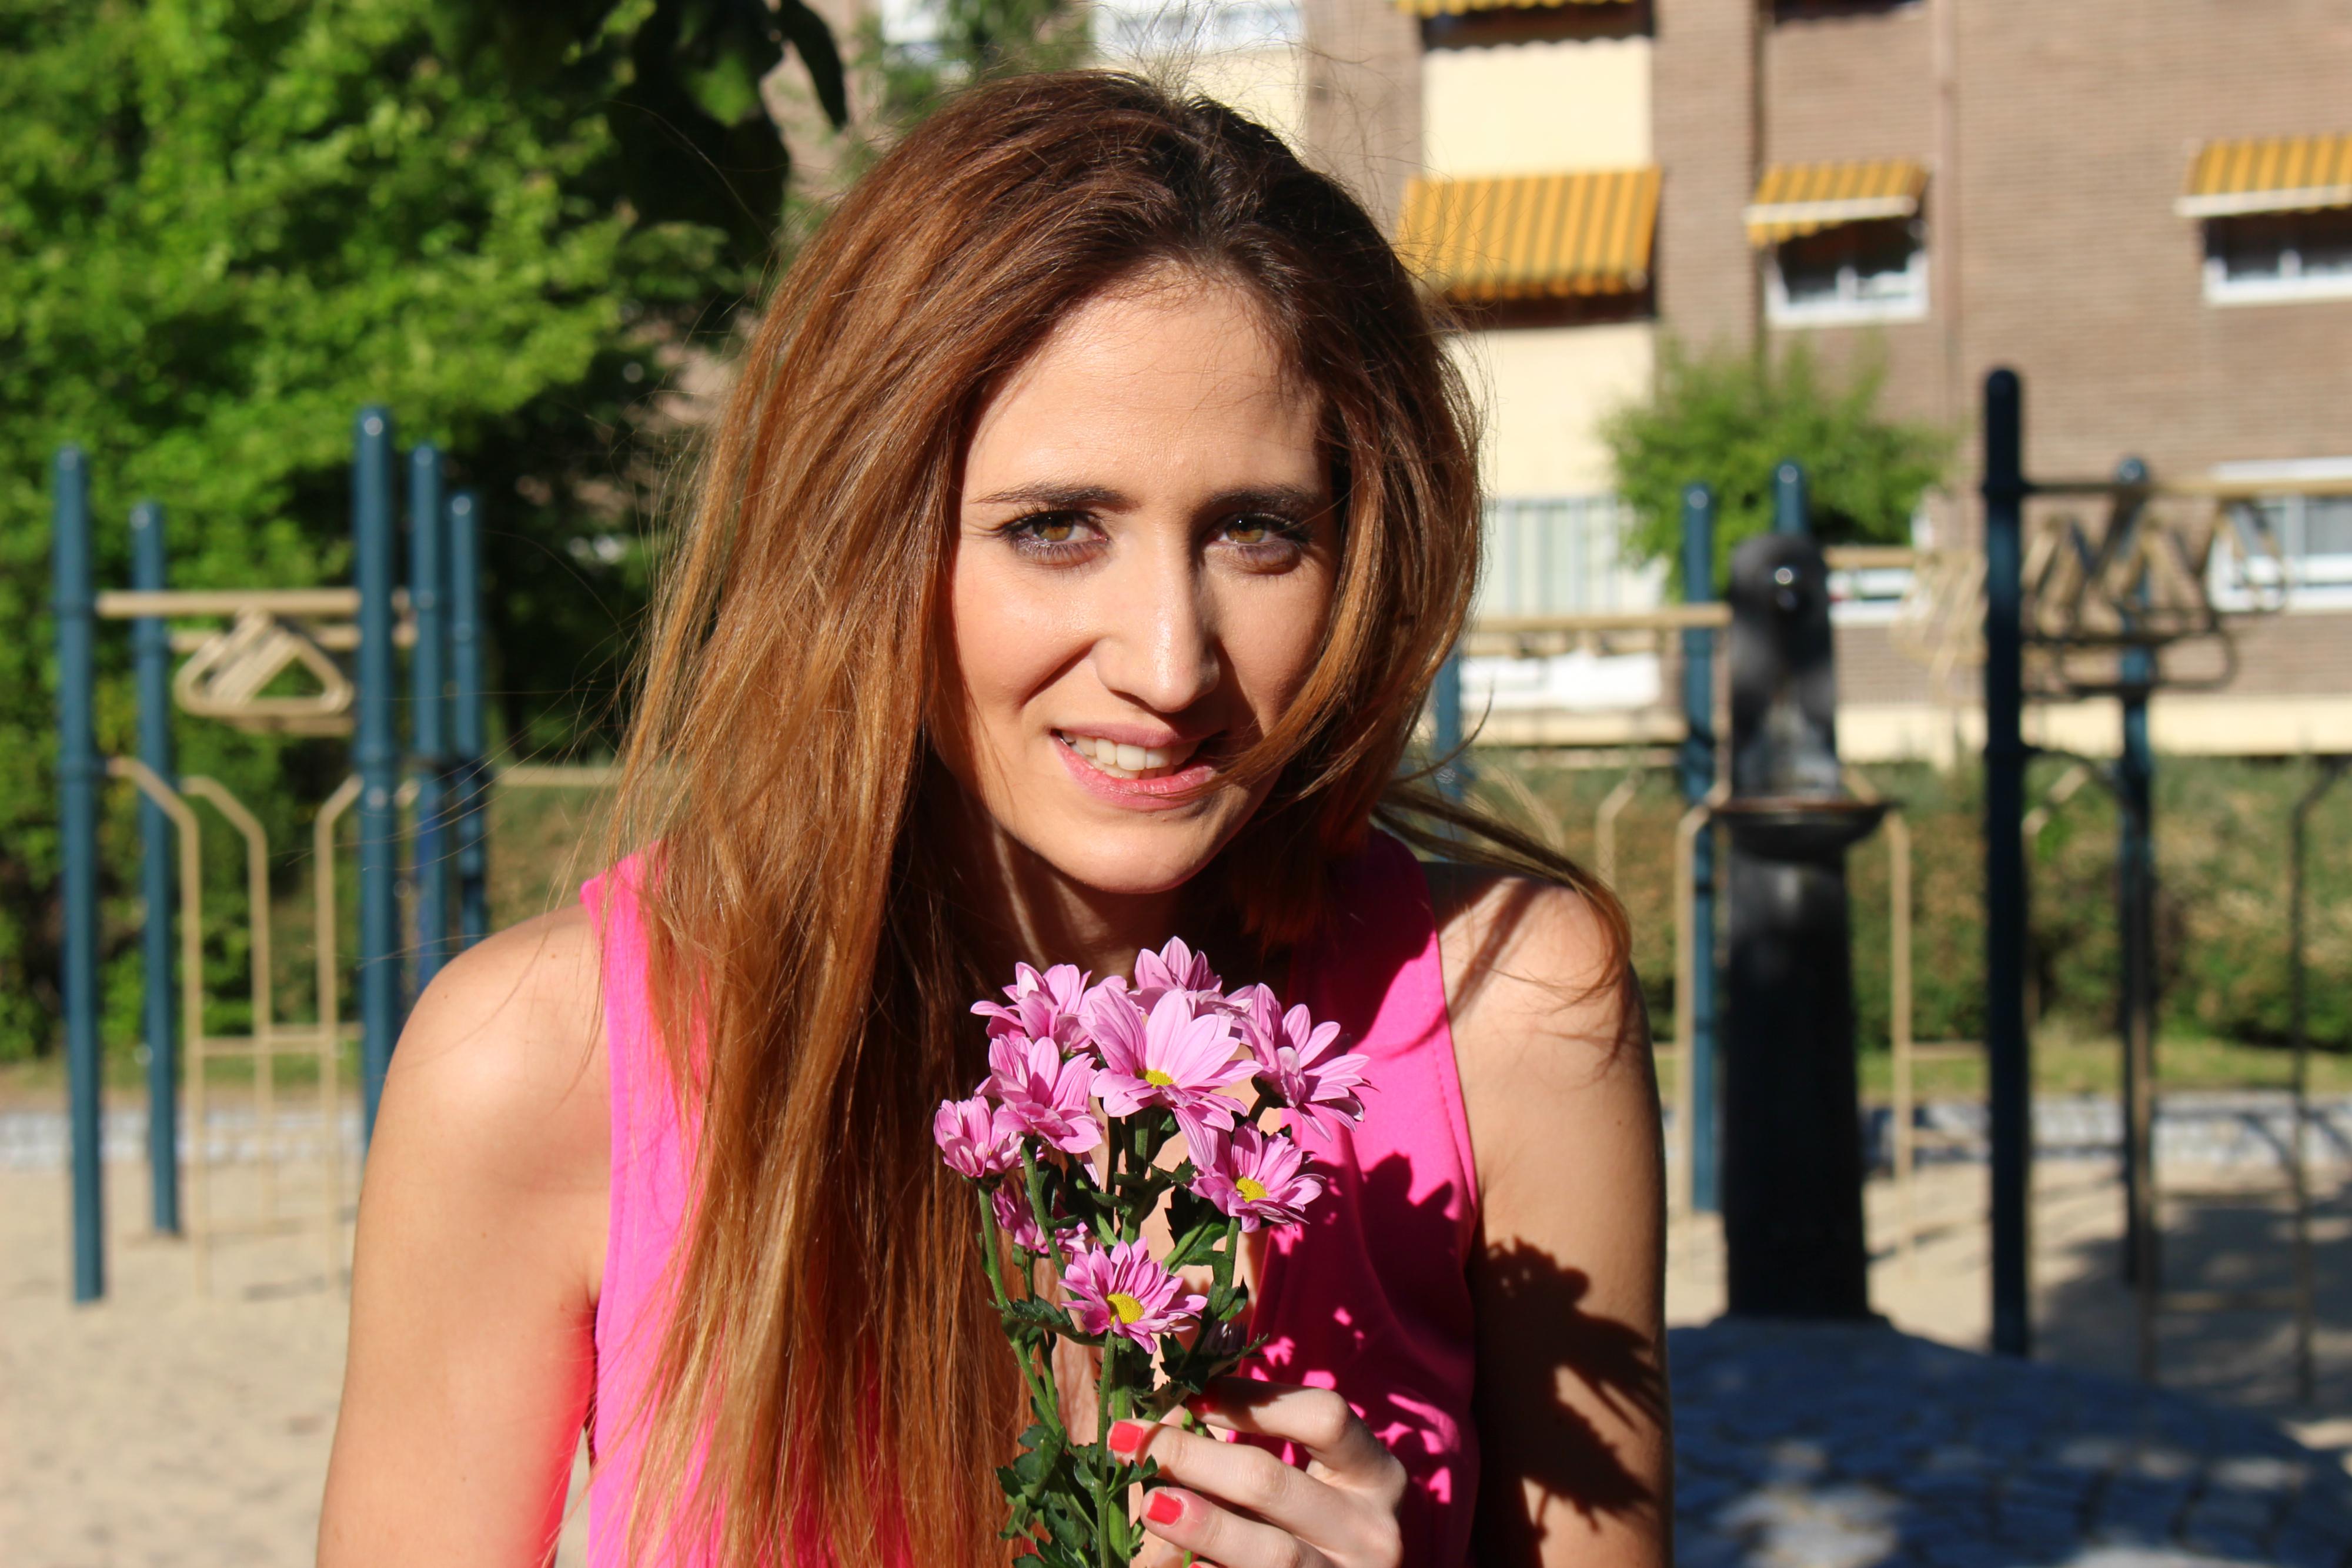 Rosa y margaritas 5